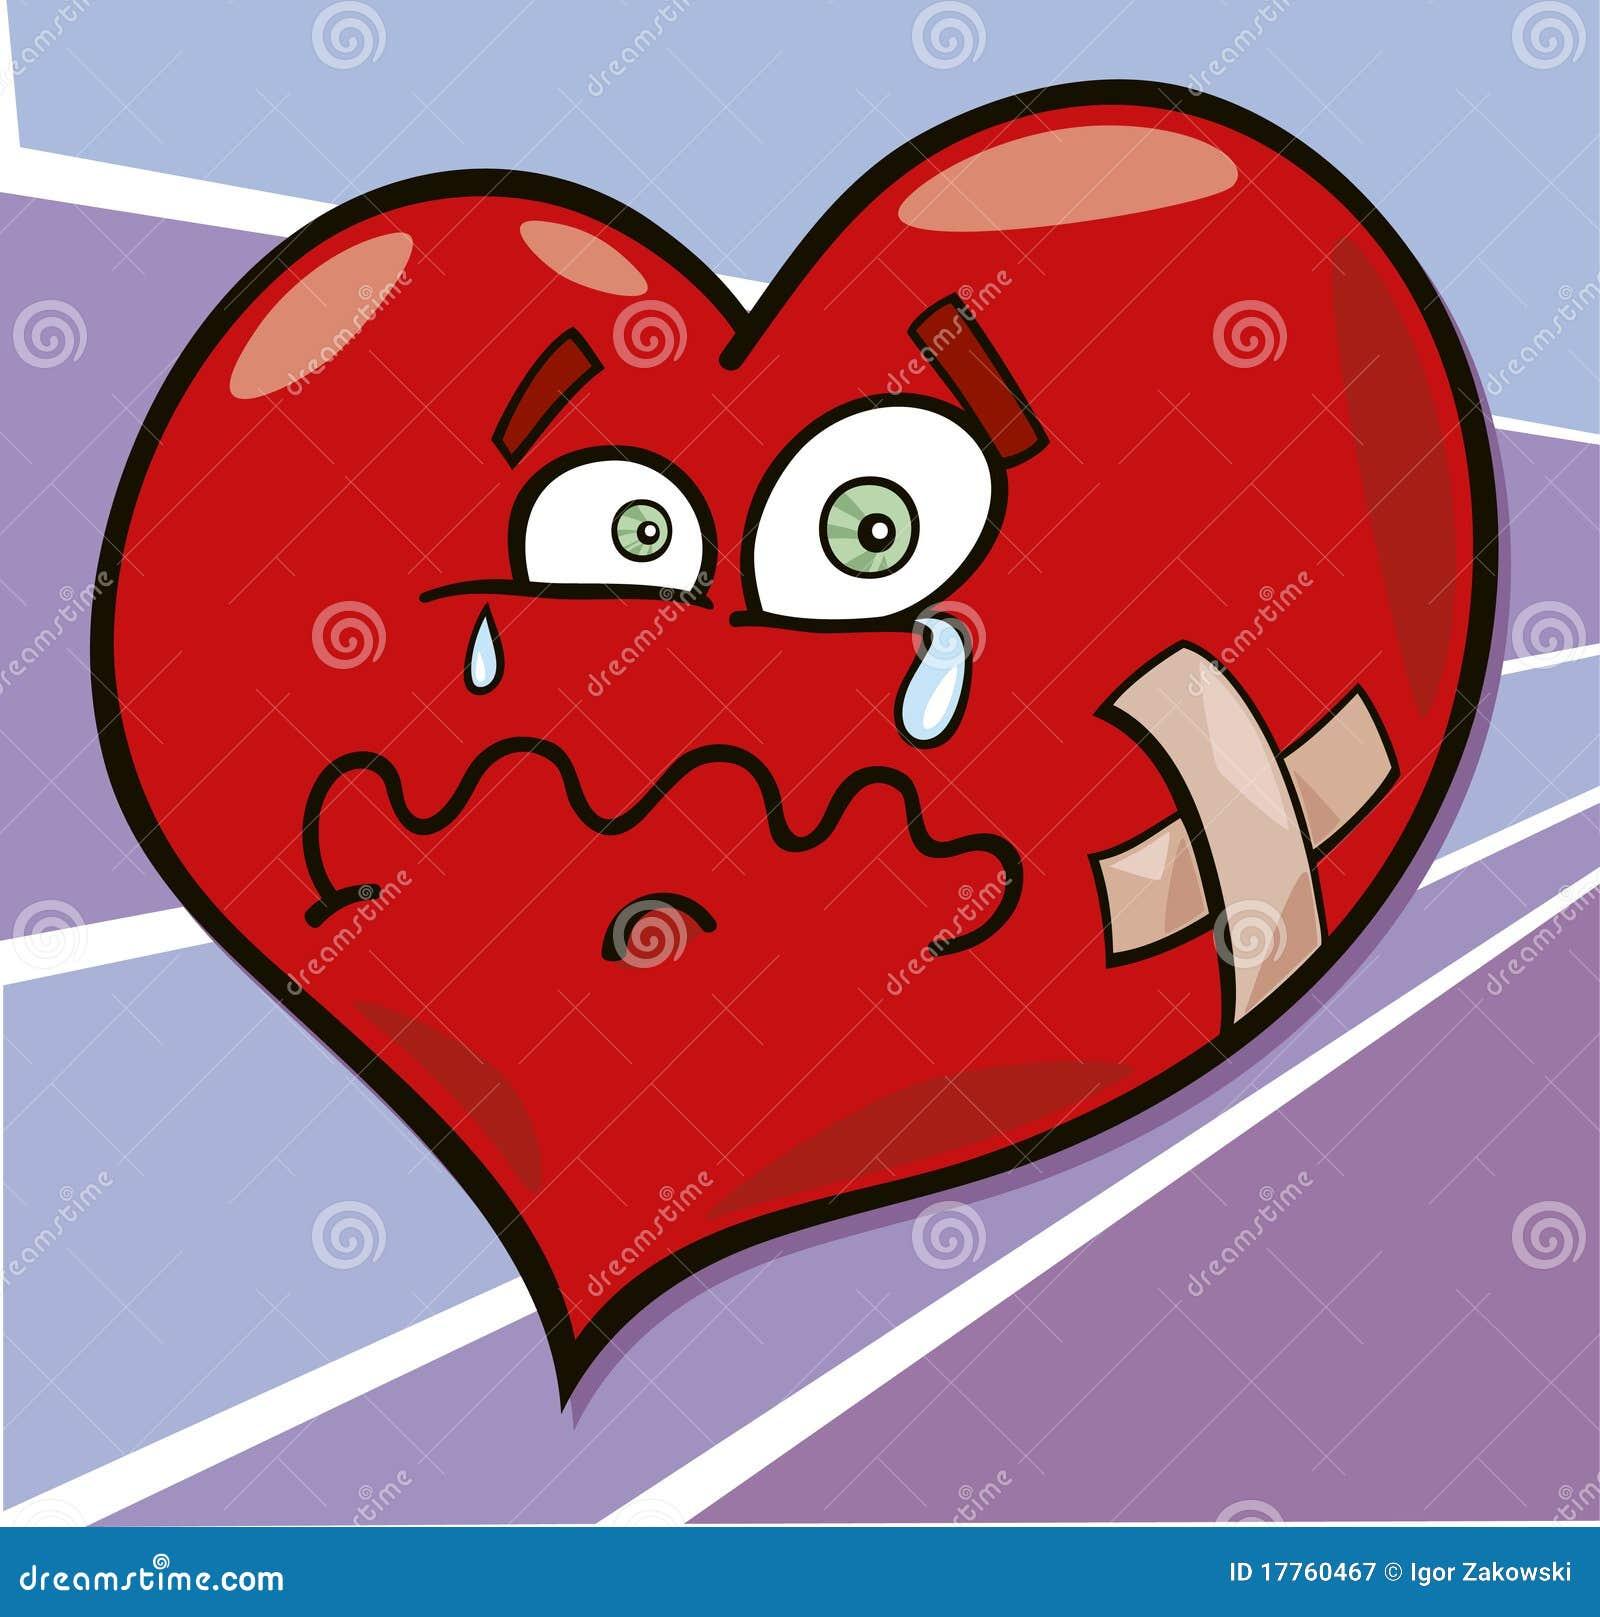 Broken Heart Royalty Free Stock Photography Image 17760467